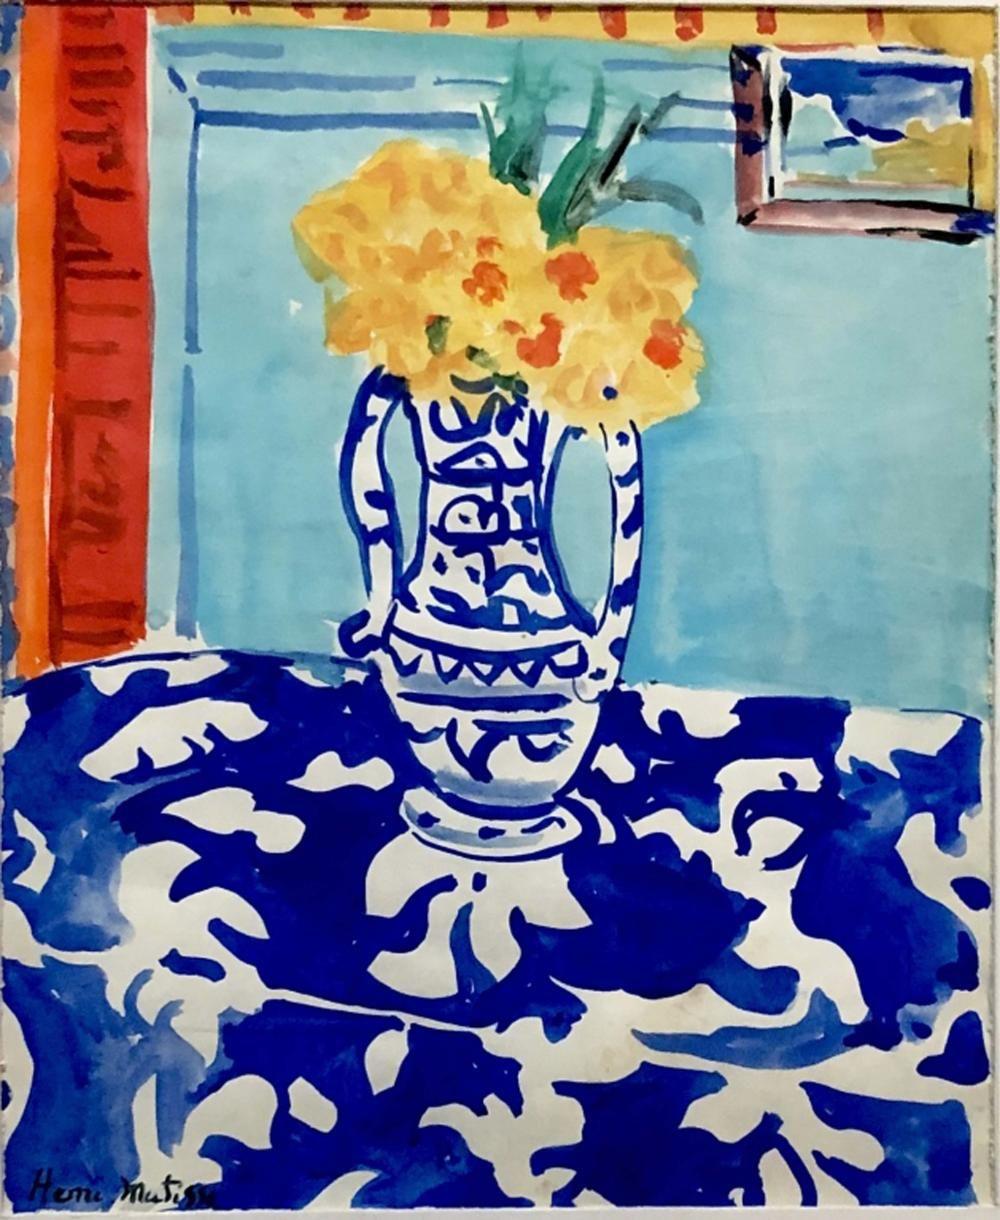 HENRI MATISSE WATERCOLOR STILL LIFE | Arte, Henri matisse ...